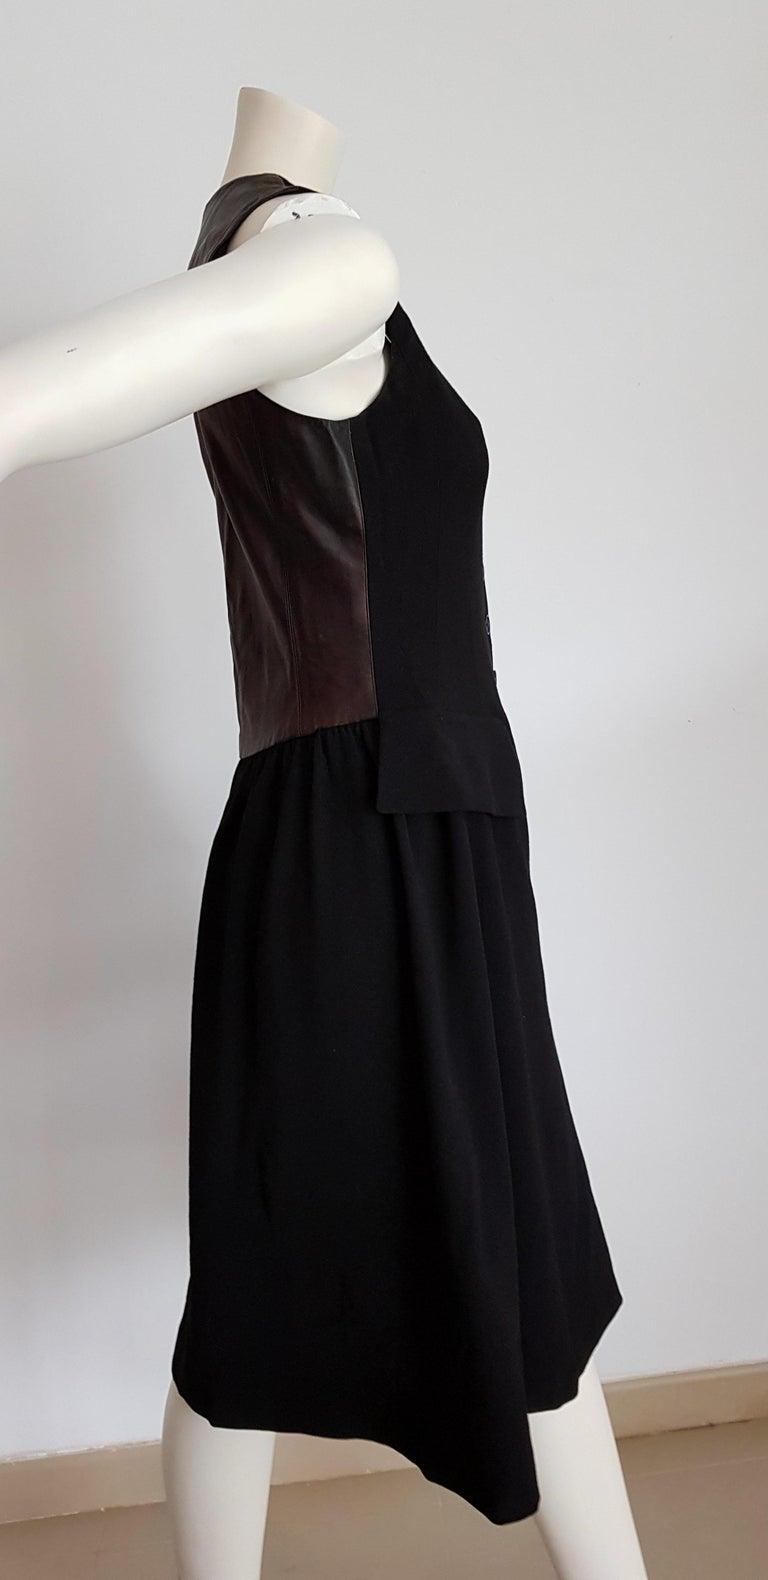 HERMES  Black Wool Leather Light Bronze Tone Lambskin Dress  In Excellent Condition For Sale In Somo (Santander), ES